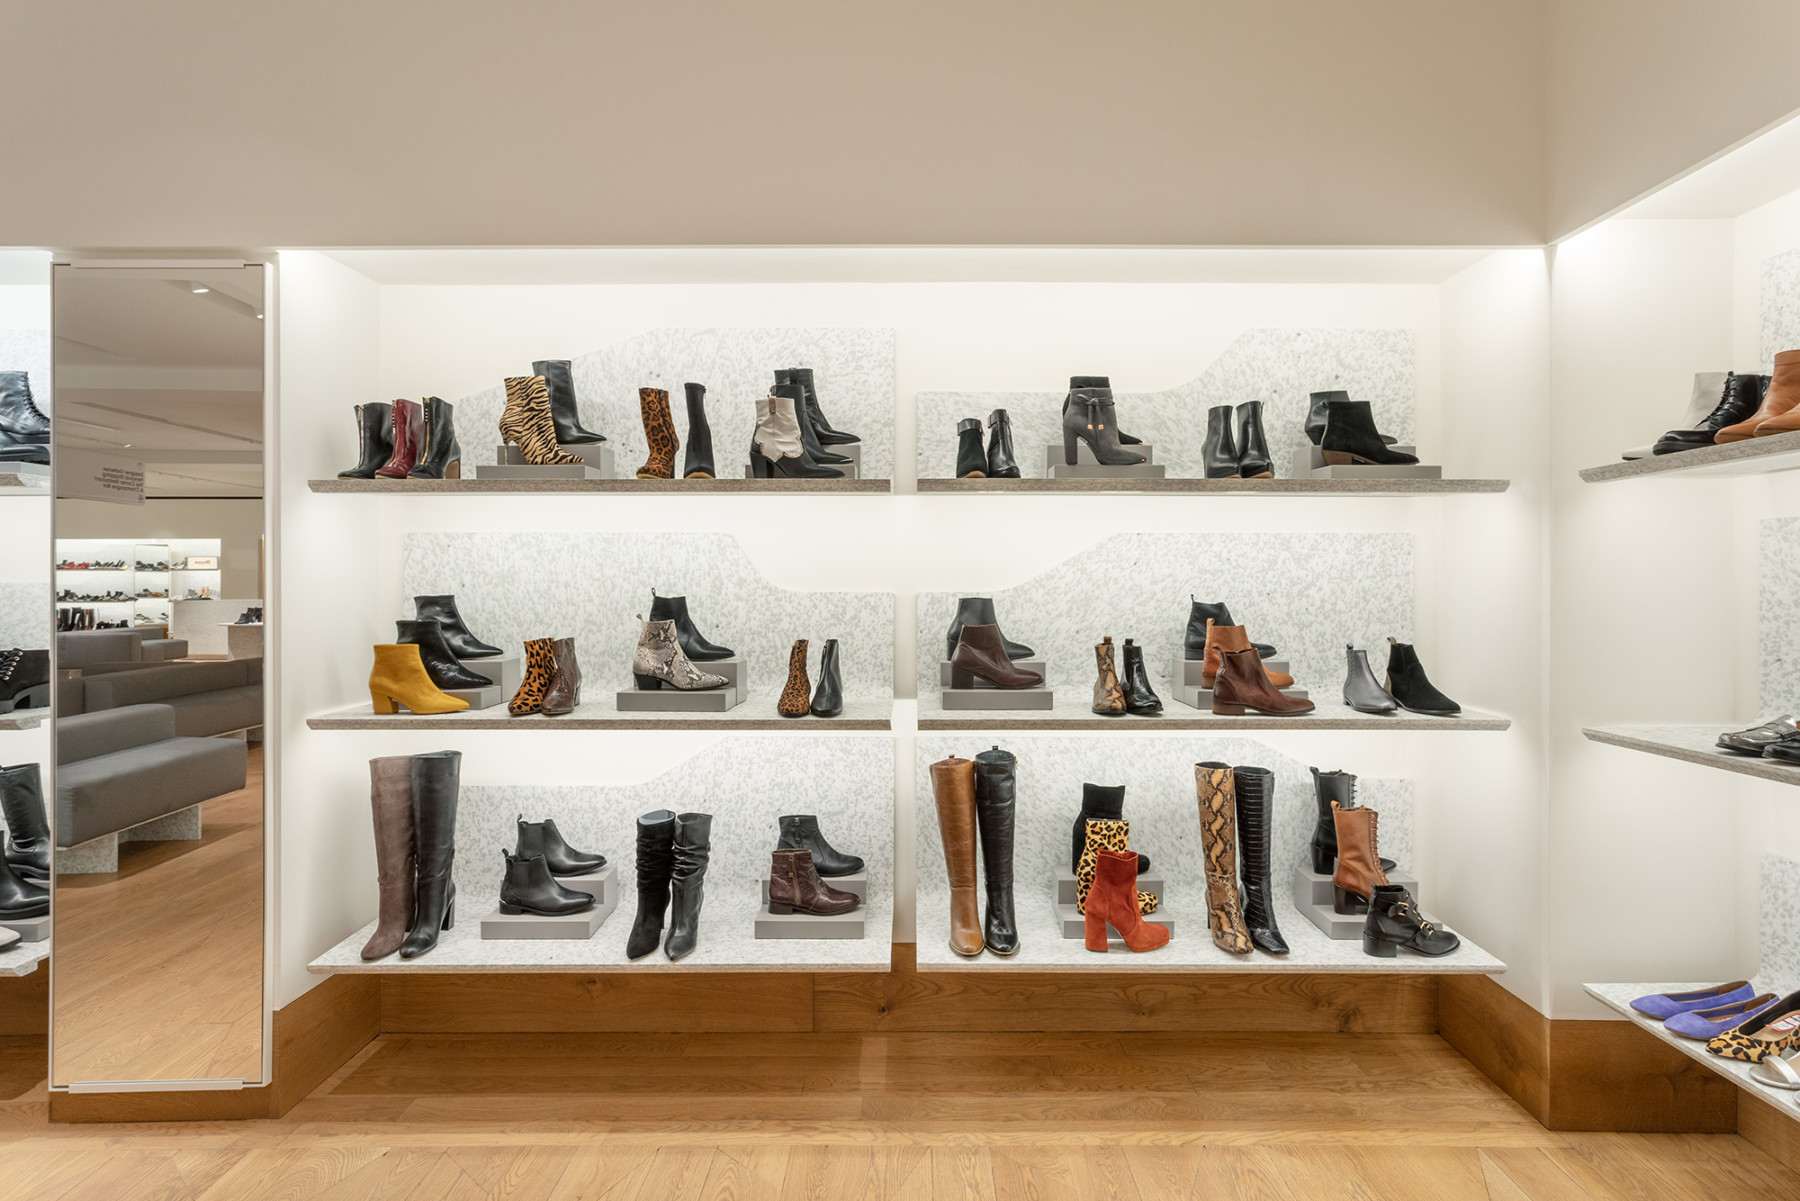 jamie-fobert-architects-selfridges-shoe-galleries-luxury-retail-concept-gallery-design-olivier-hess-photos-(3)